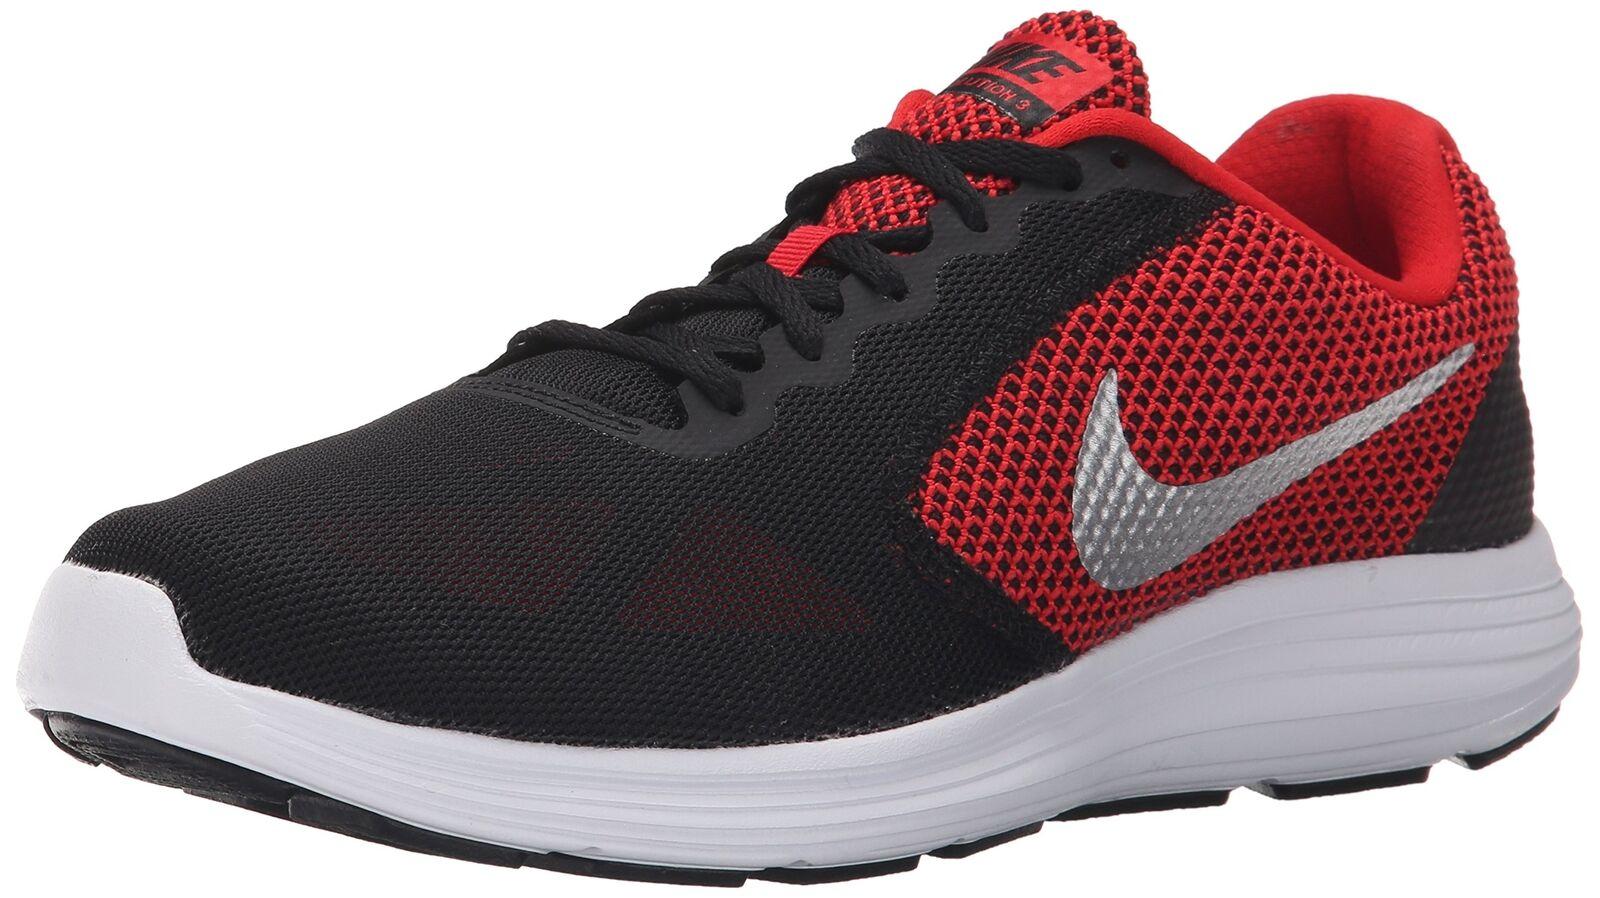 NIKE Running Men's Revolution 3 Running NIKE Shoe University Red/Black/White/Metallic Silver 7defbd